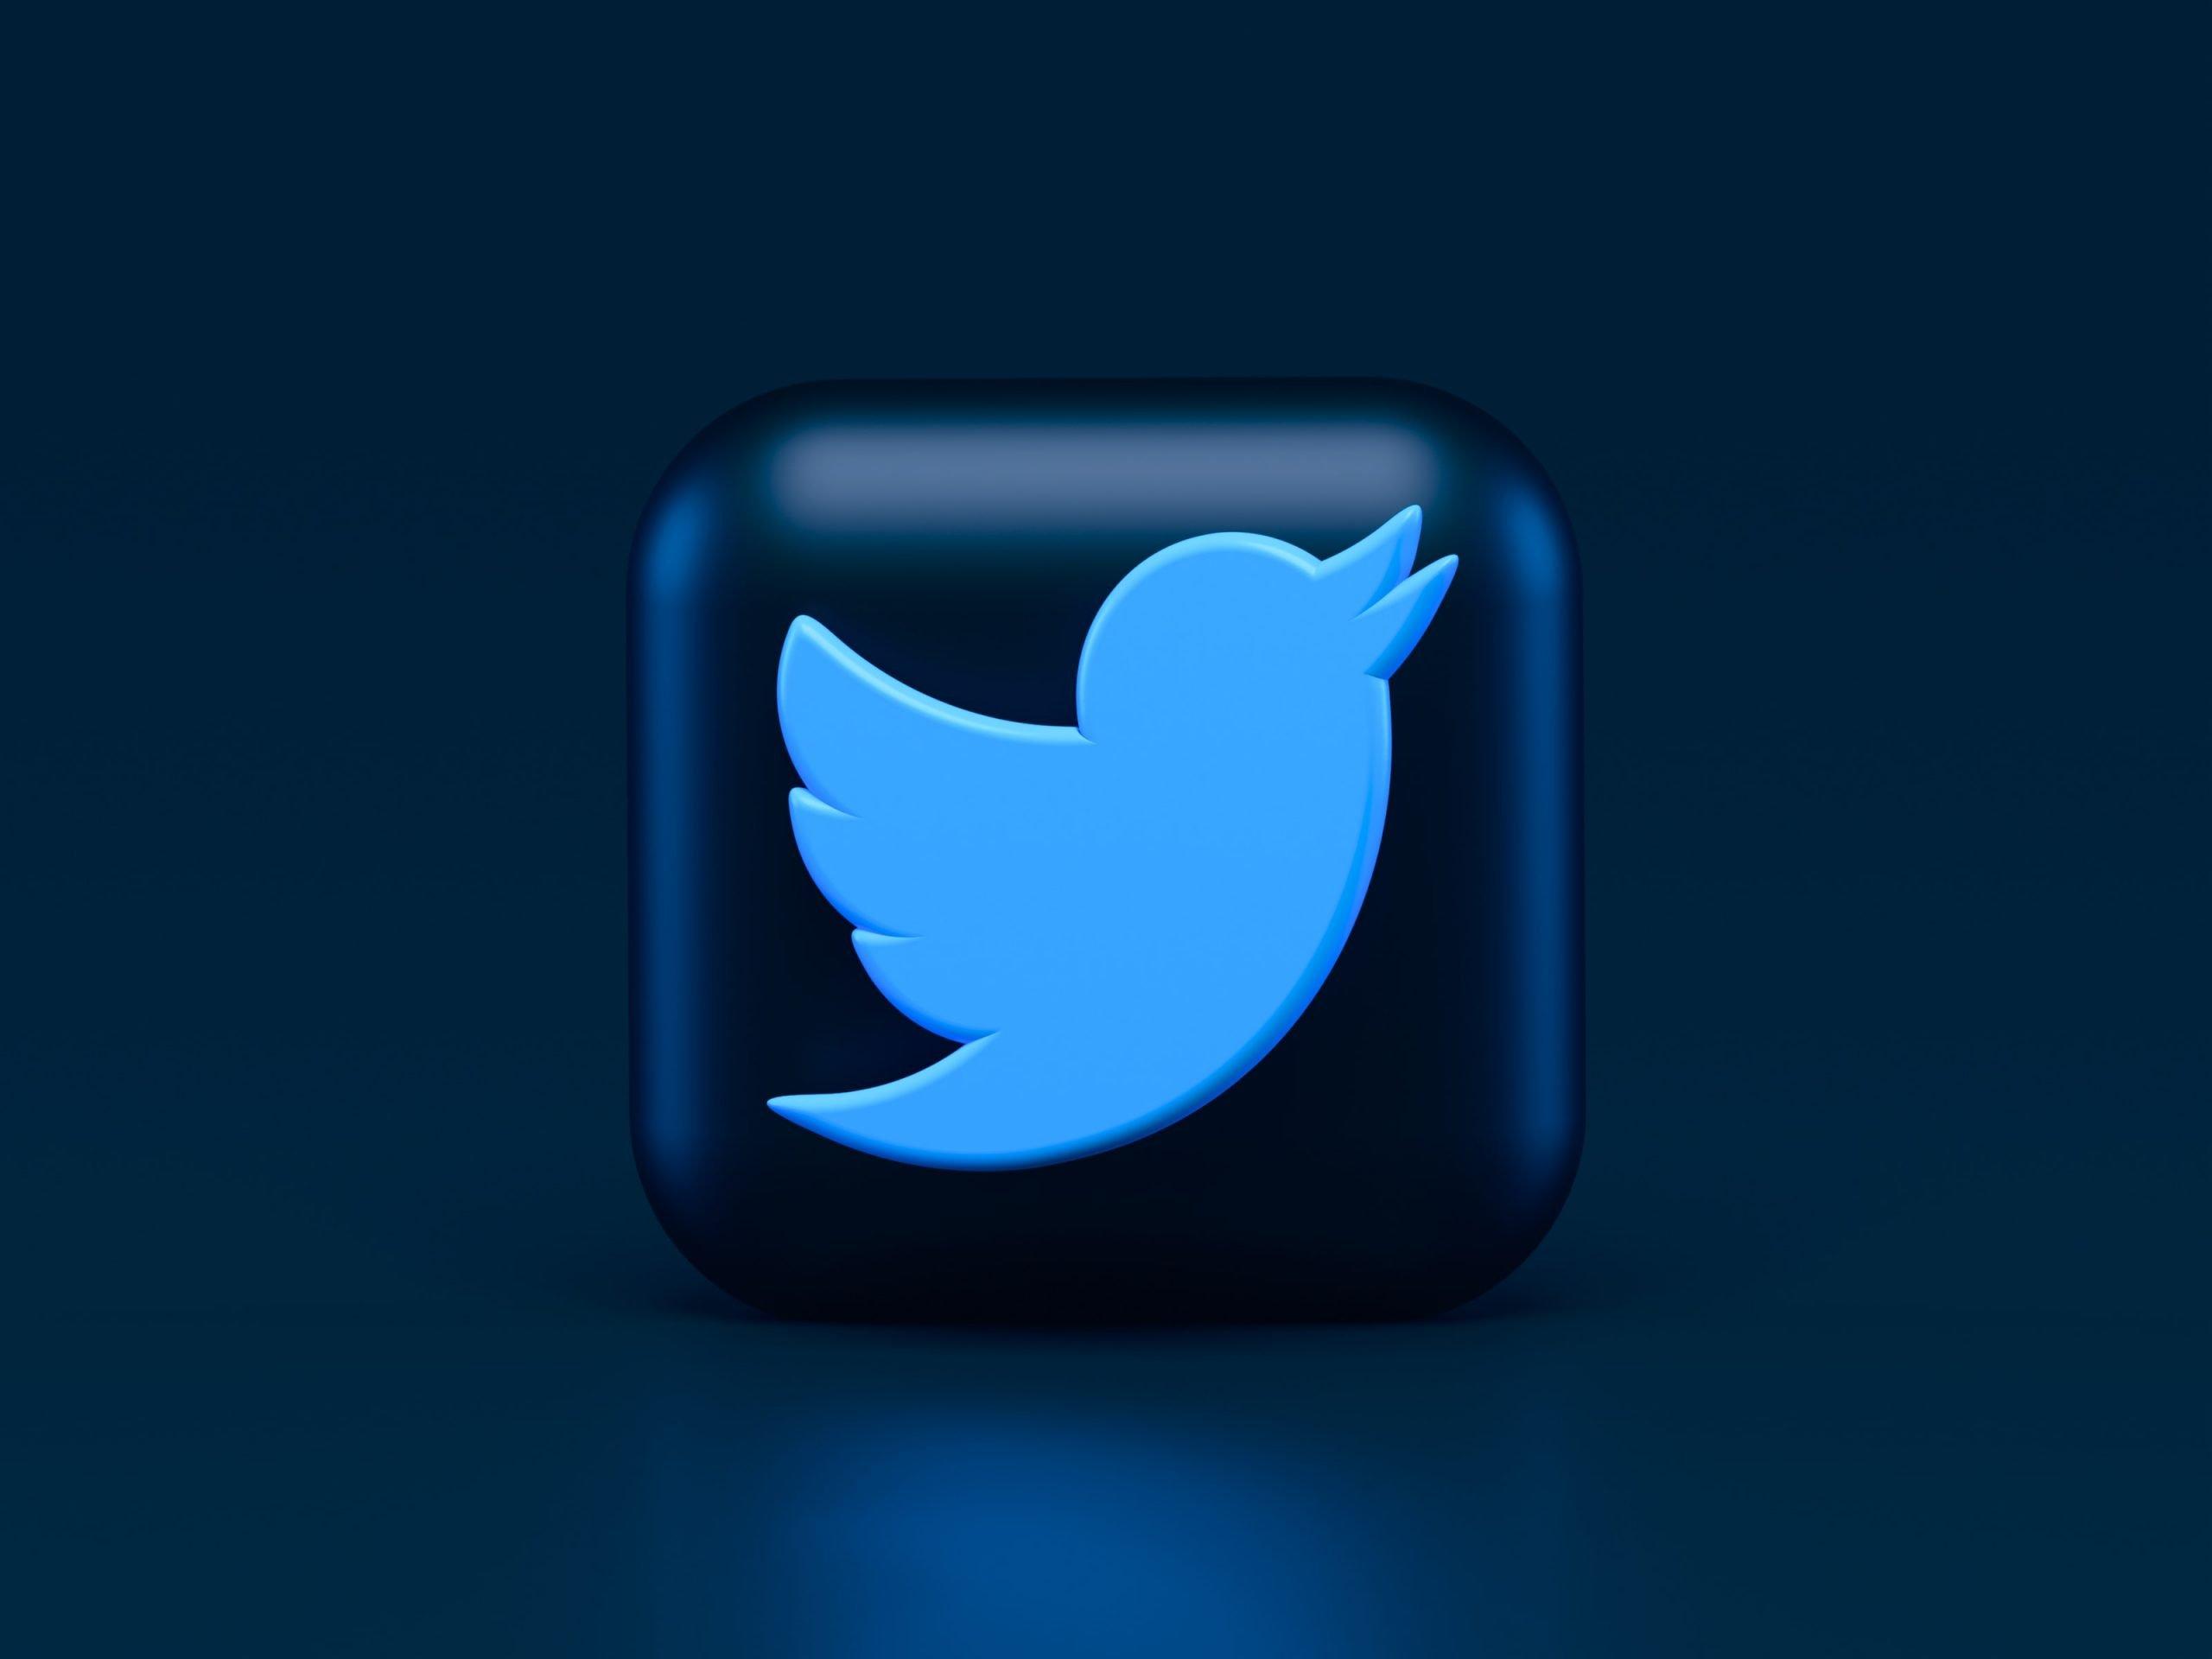 L'idea di Twitter dei Super Follows